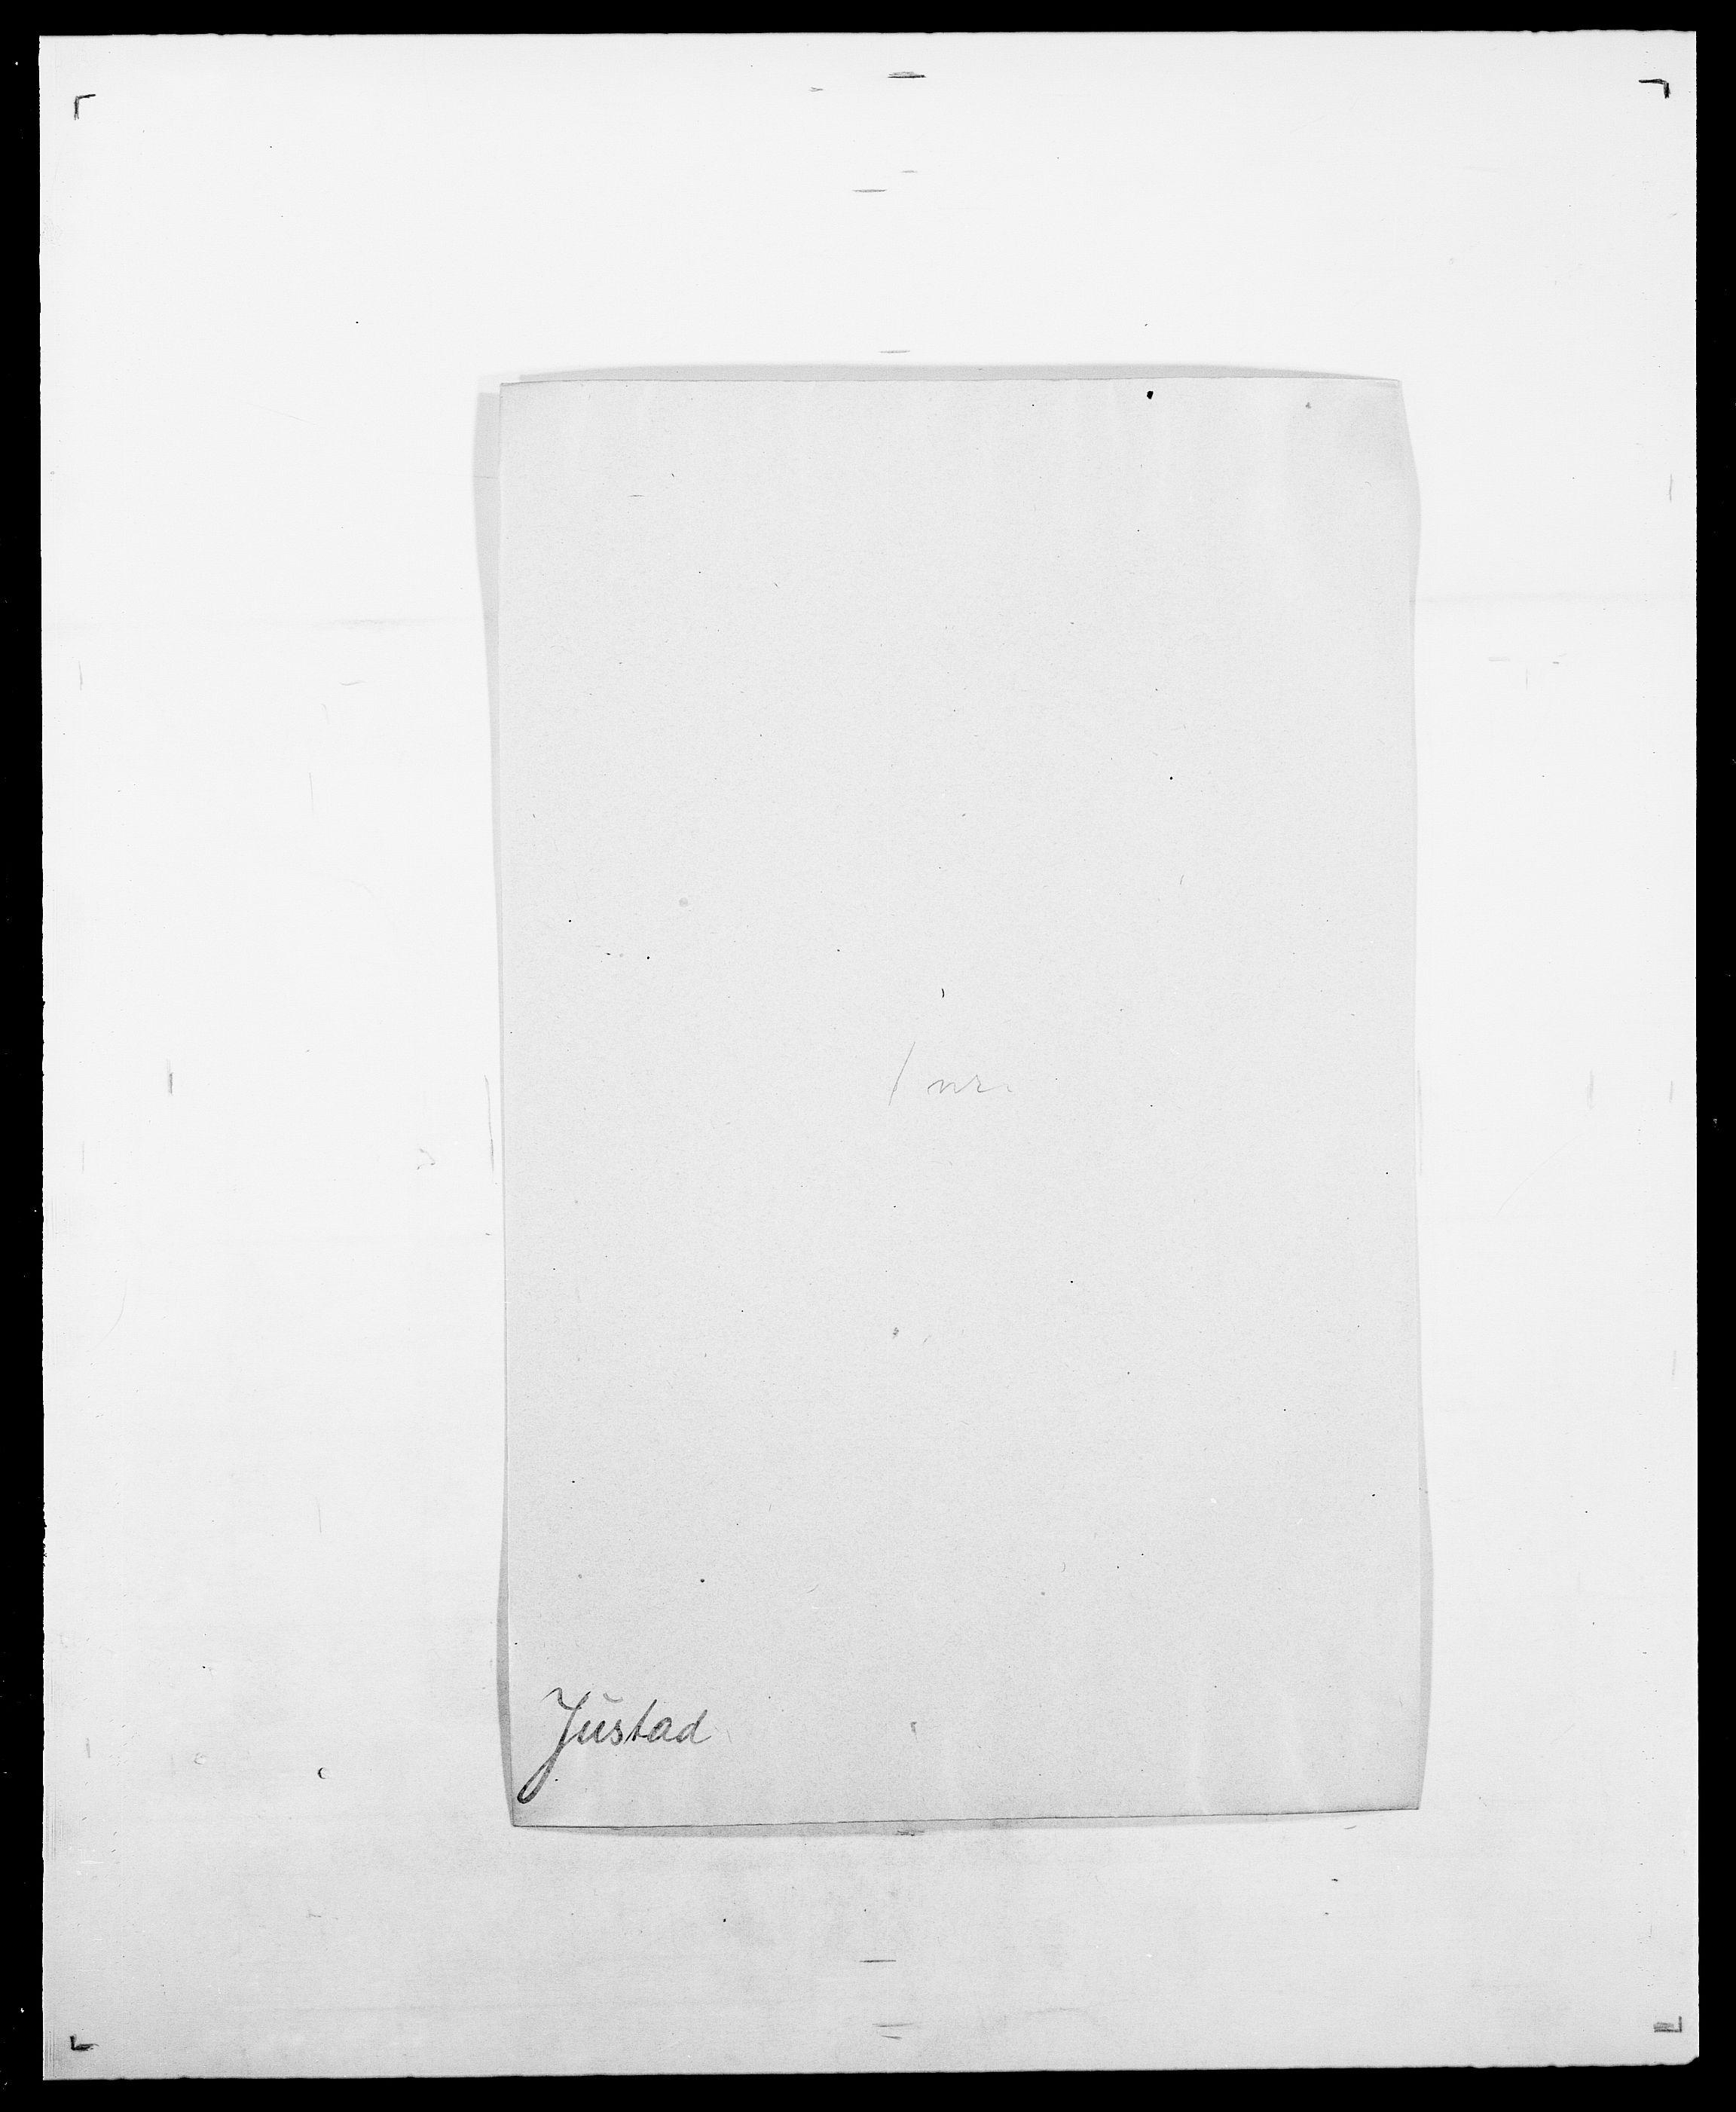 SAO, Delgobe, Charles Antoine - samling, D/Da/L0020: Irgens - Kjøsterud, s. 186